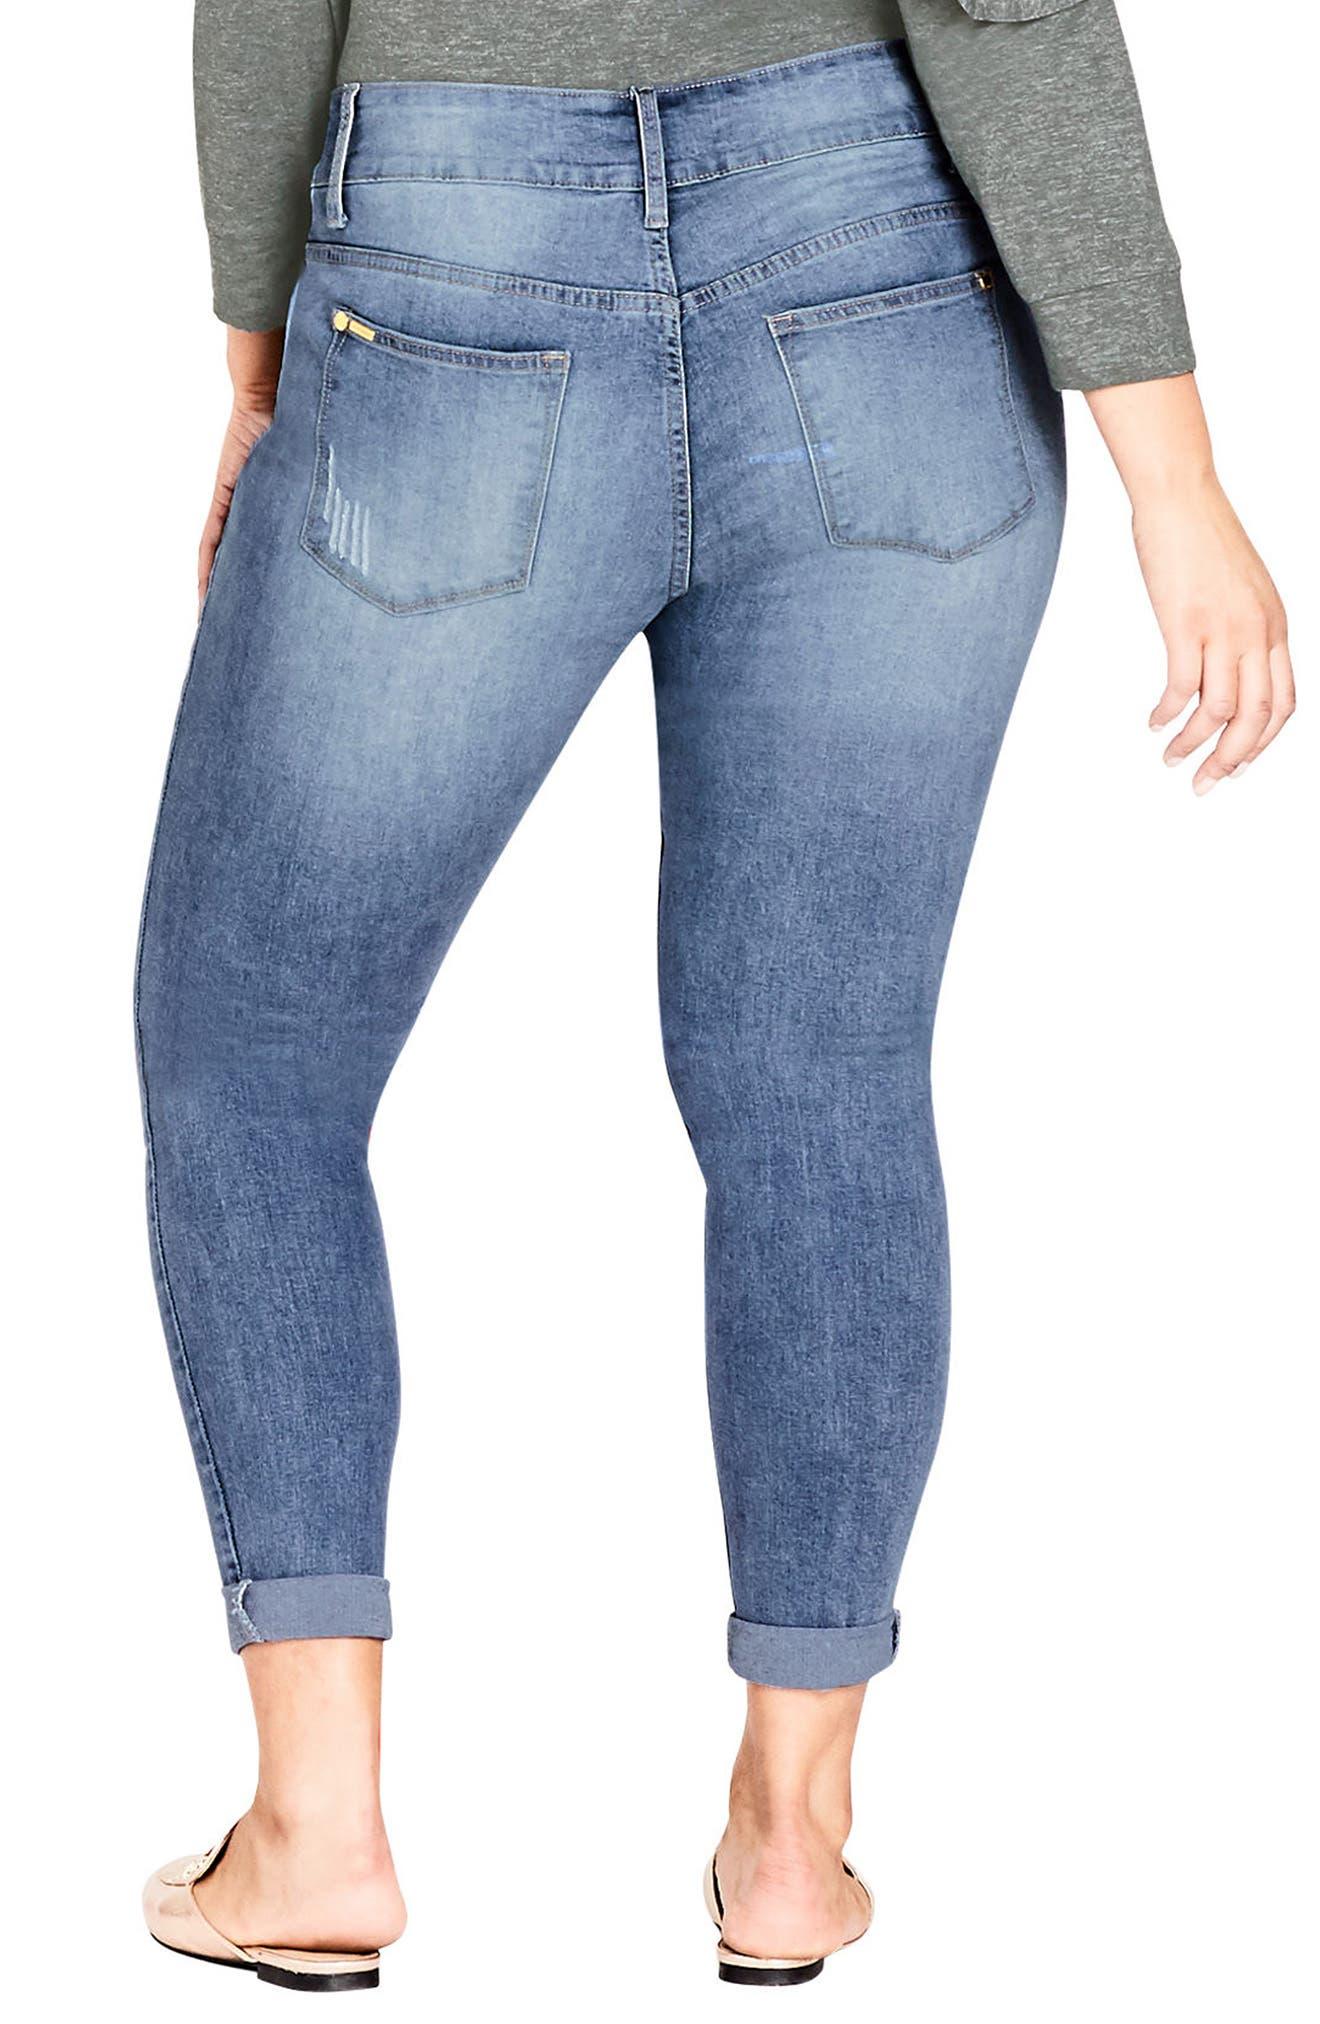 Ripped Up Skinny Jeans,                             Alternate thumbnail 2, color,                             Light Denim